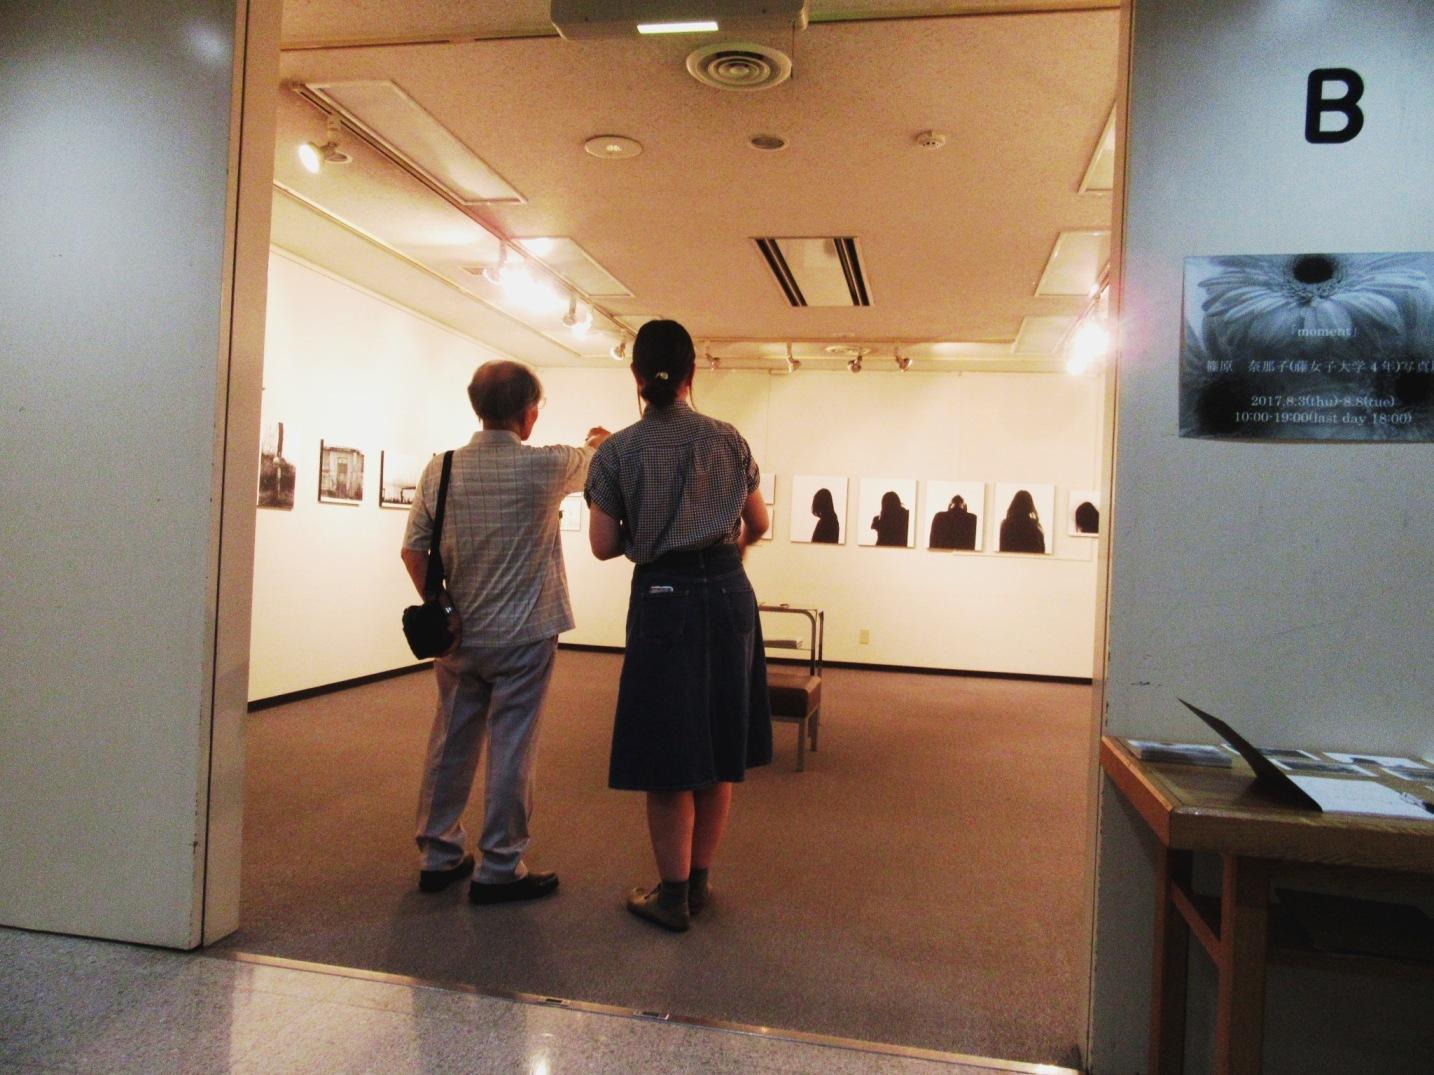 2569)②「『moment』 篠原 奈那子(藤女子大学4年)写真展」 アートスペース201 8月3日(木)~8月7日(火)_f0126829_10574862.jpg